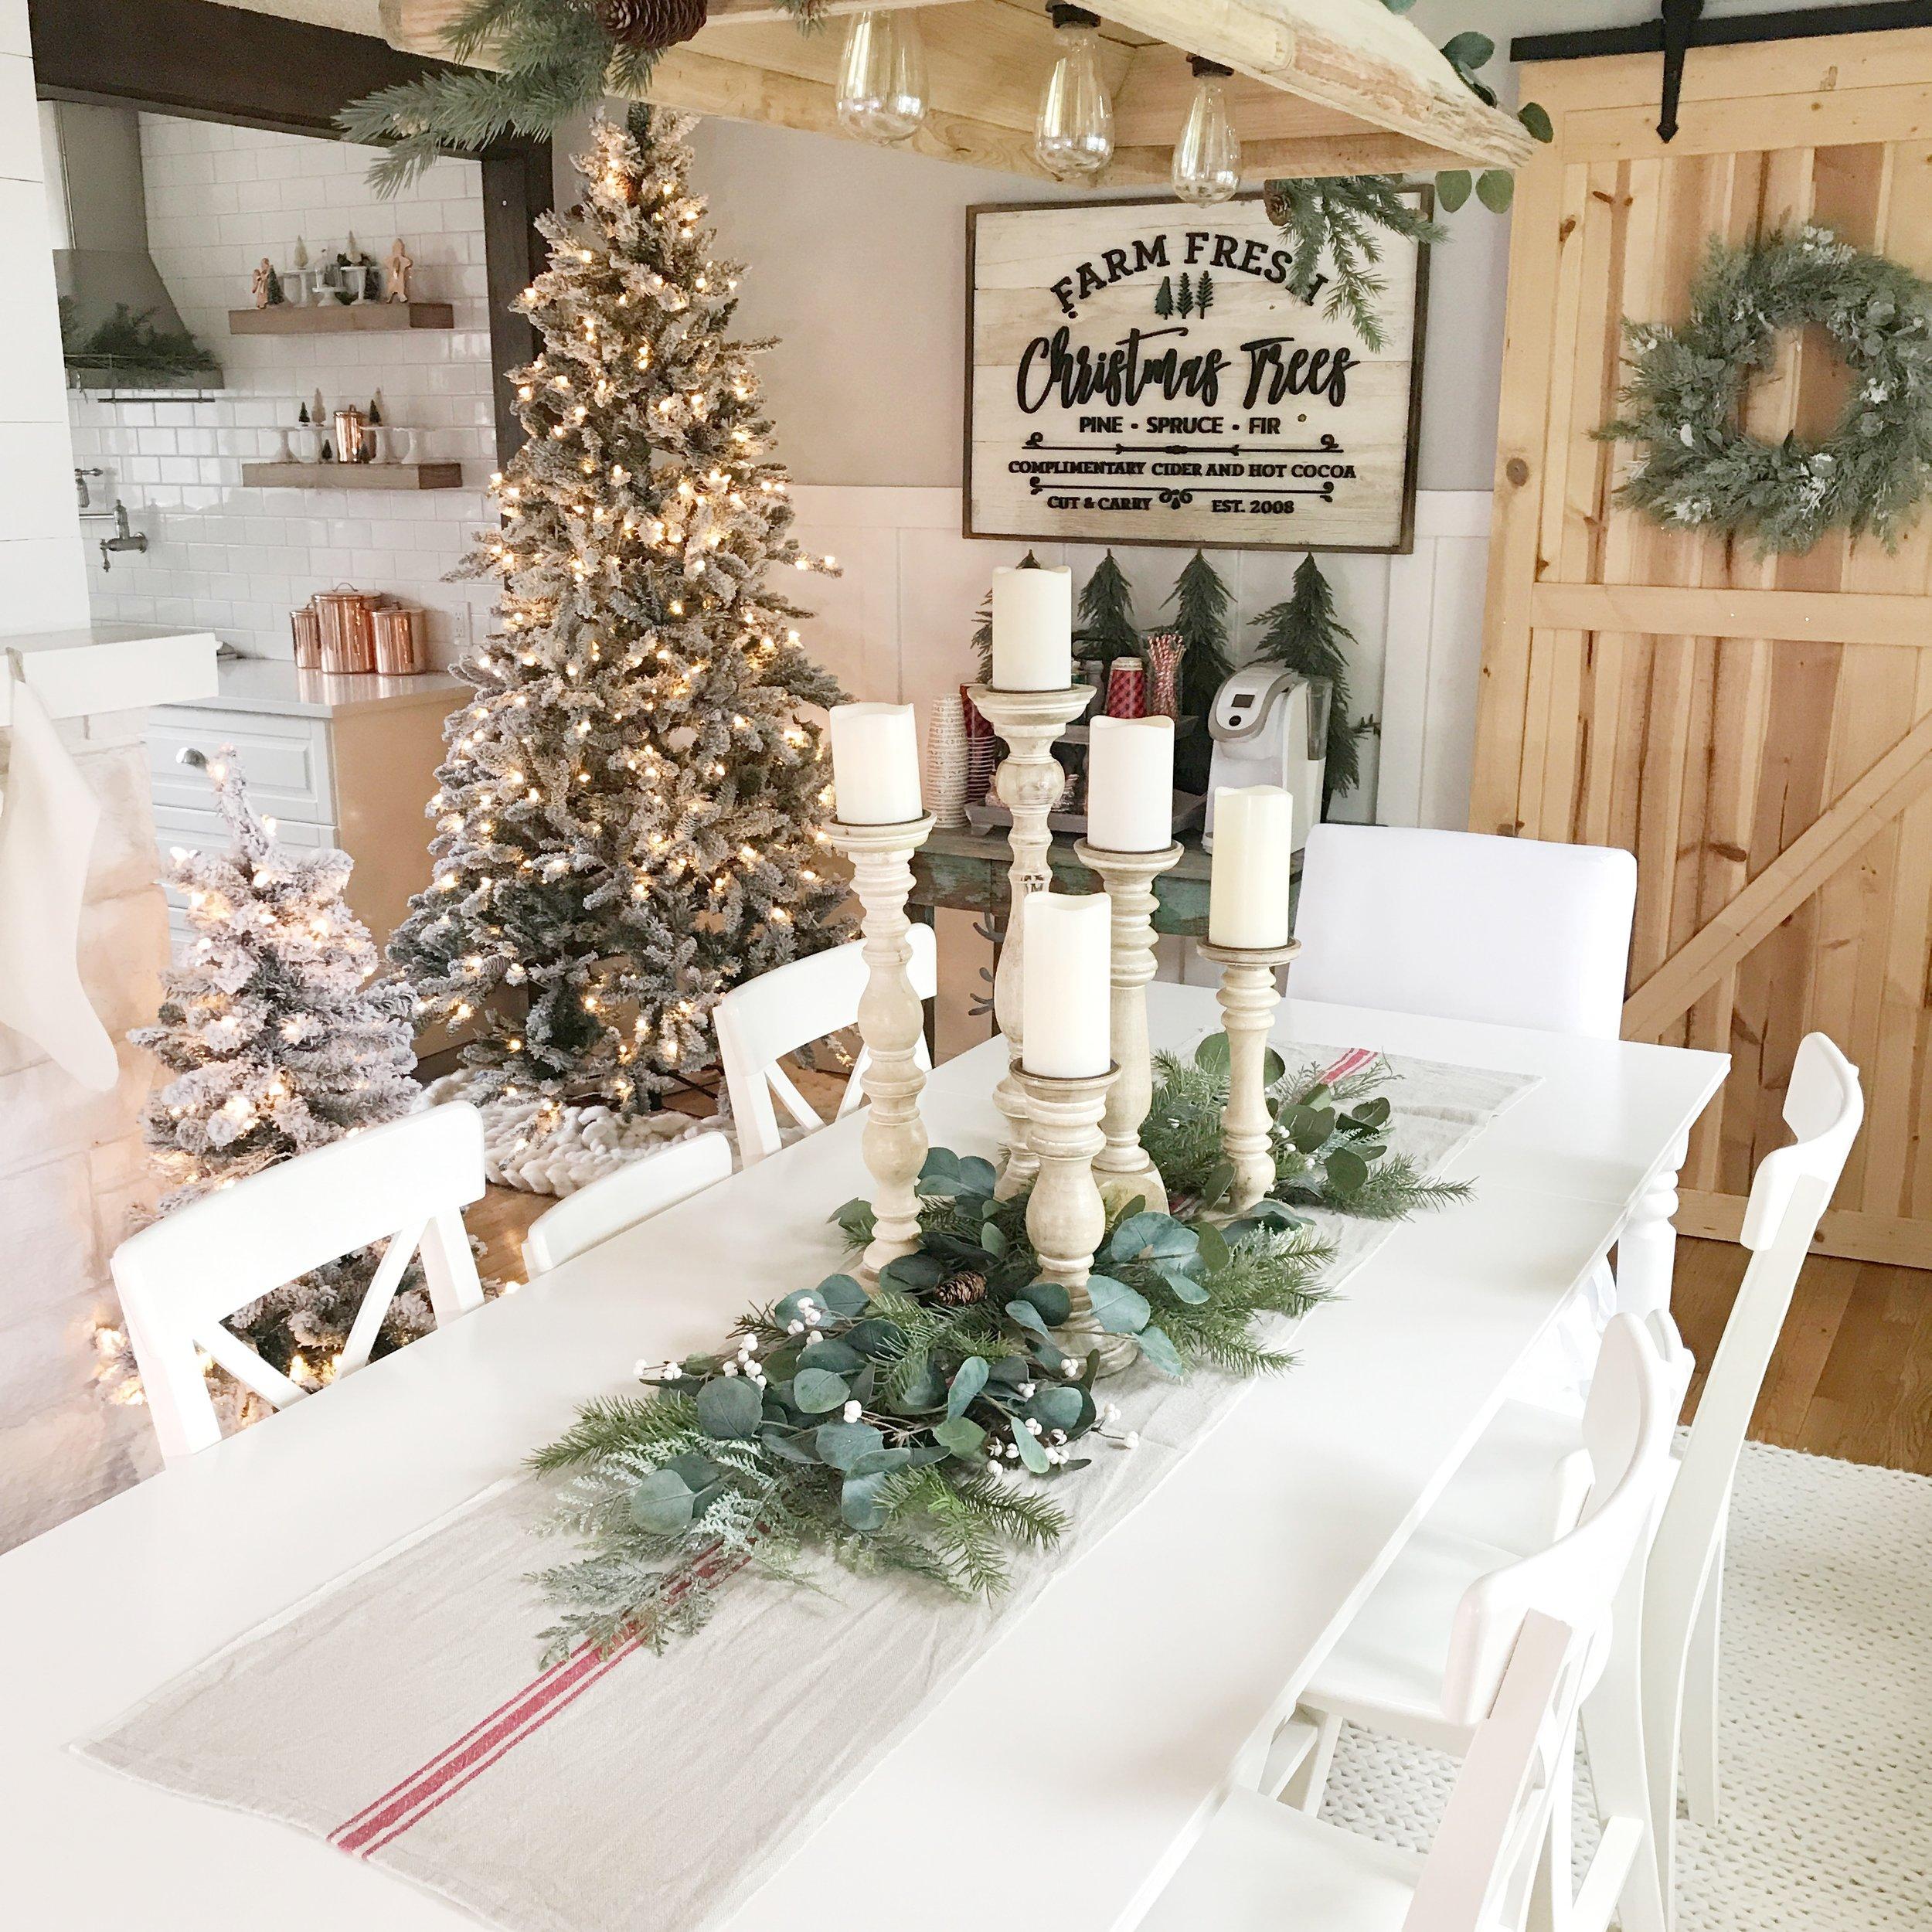 Chandelier  :  Antique Farmhouse   Christmas Tree Sign  :  Harper Grayce   Wreath  :  Walnut Harbor